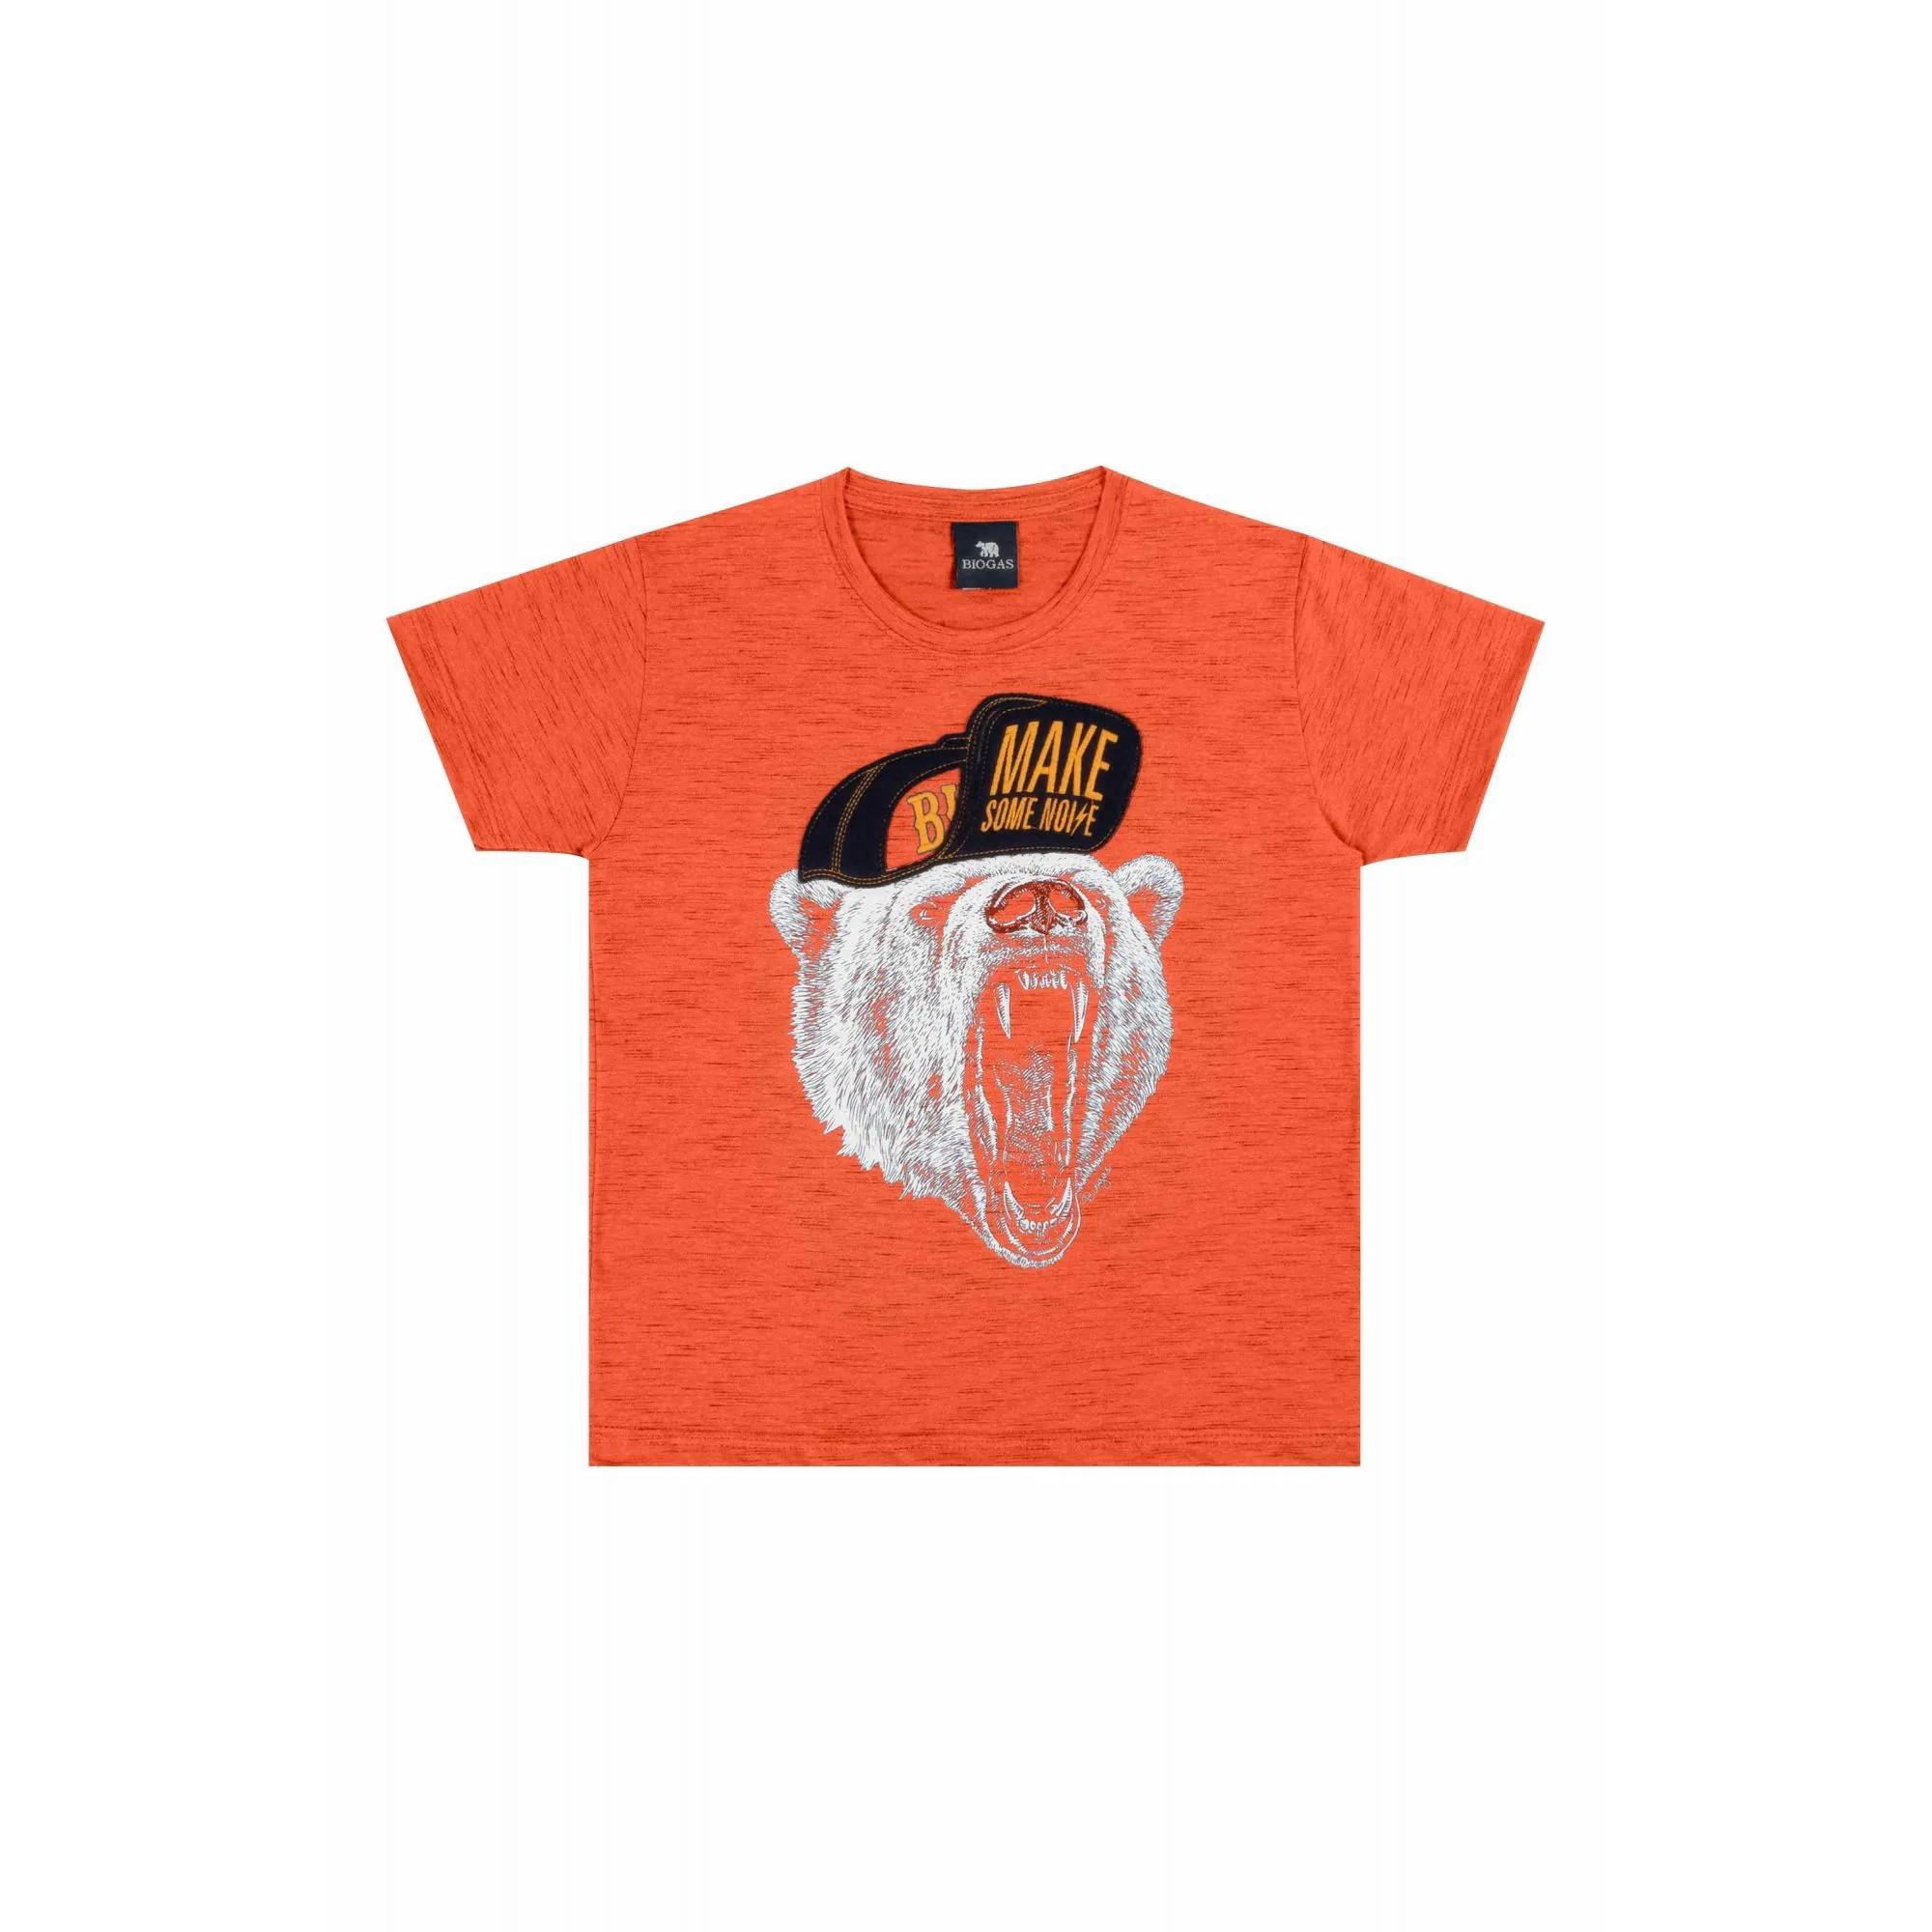 Camiseta Masculino Tr Inf Bg Tangerina 22825